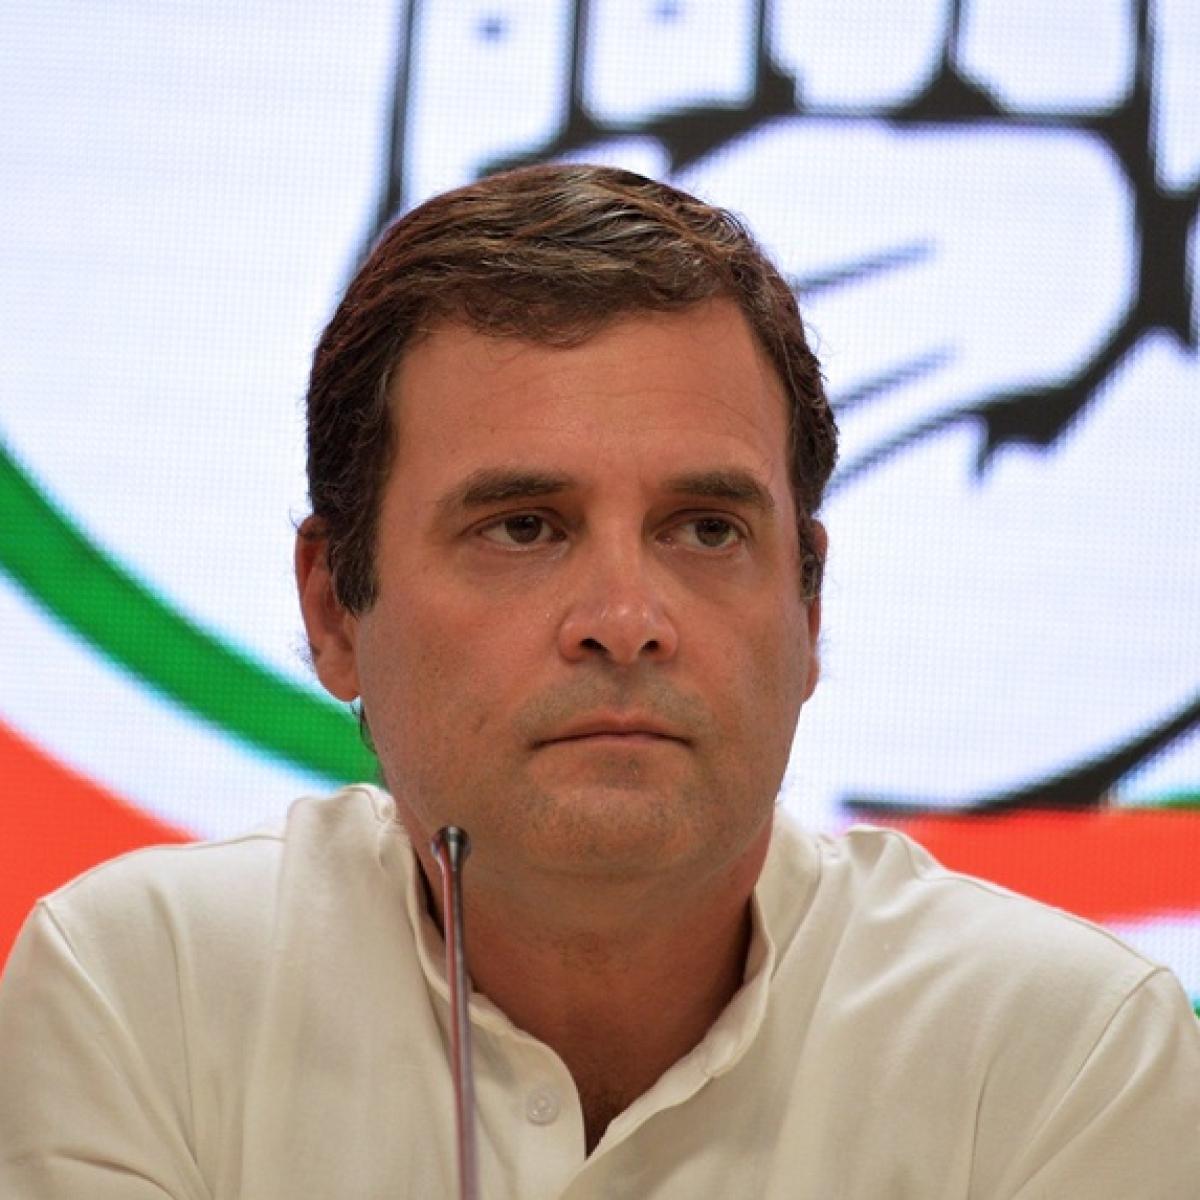 50 days on, Congress yet to find successor to Rahul Gandhi